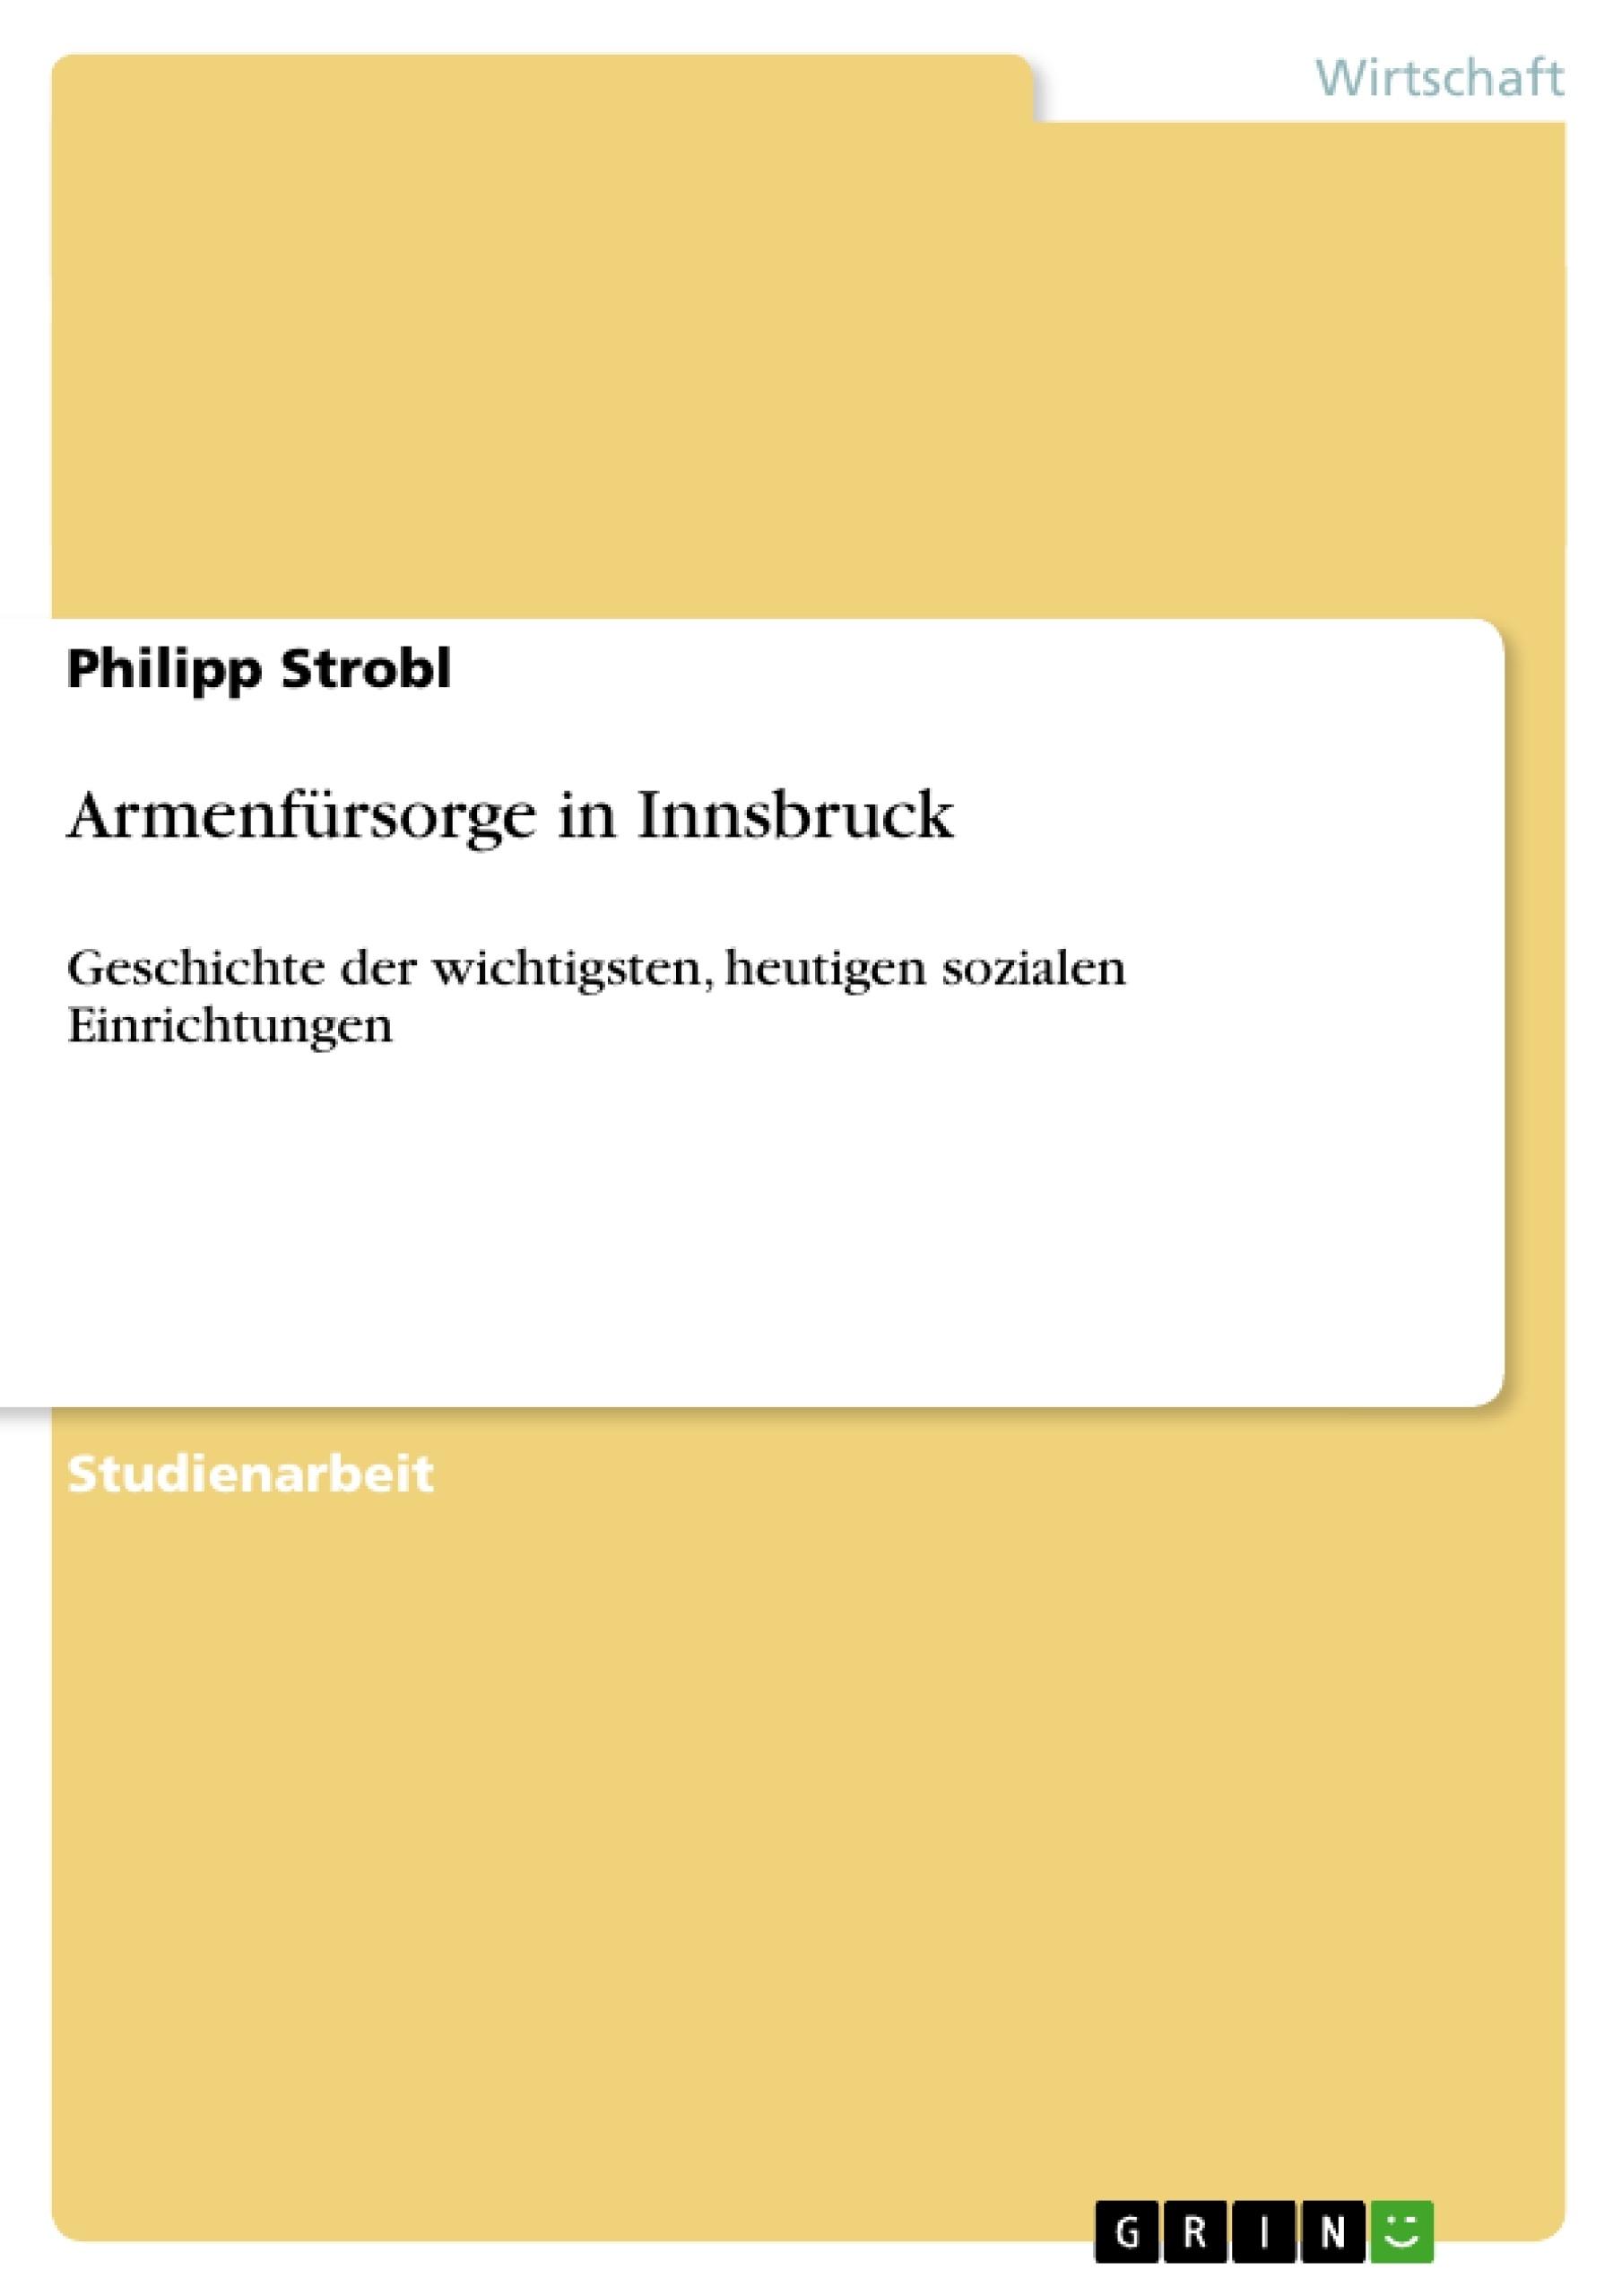 Titel: Armenfürsorge in Innsbruck